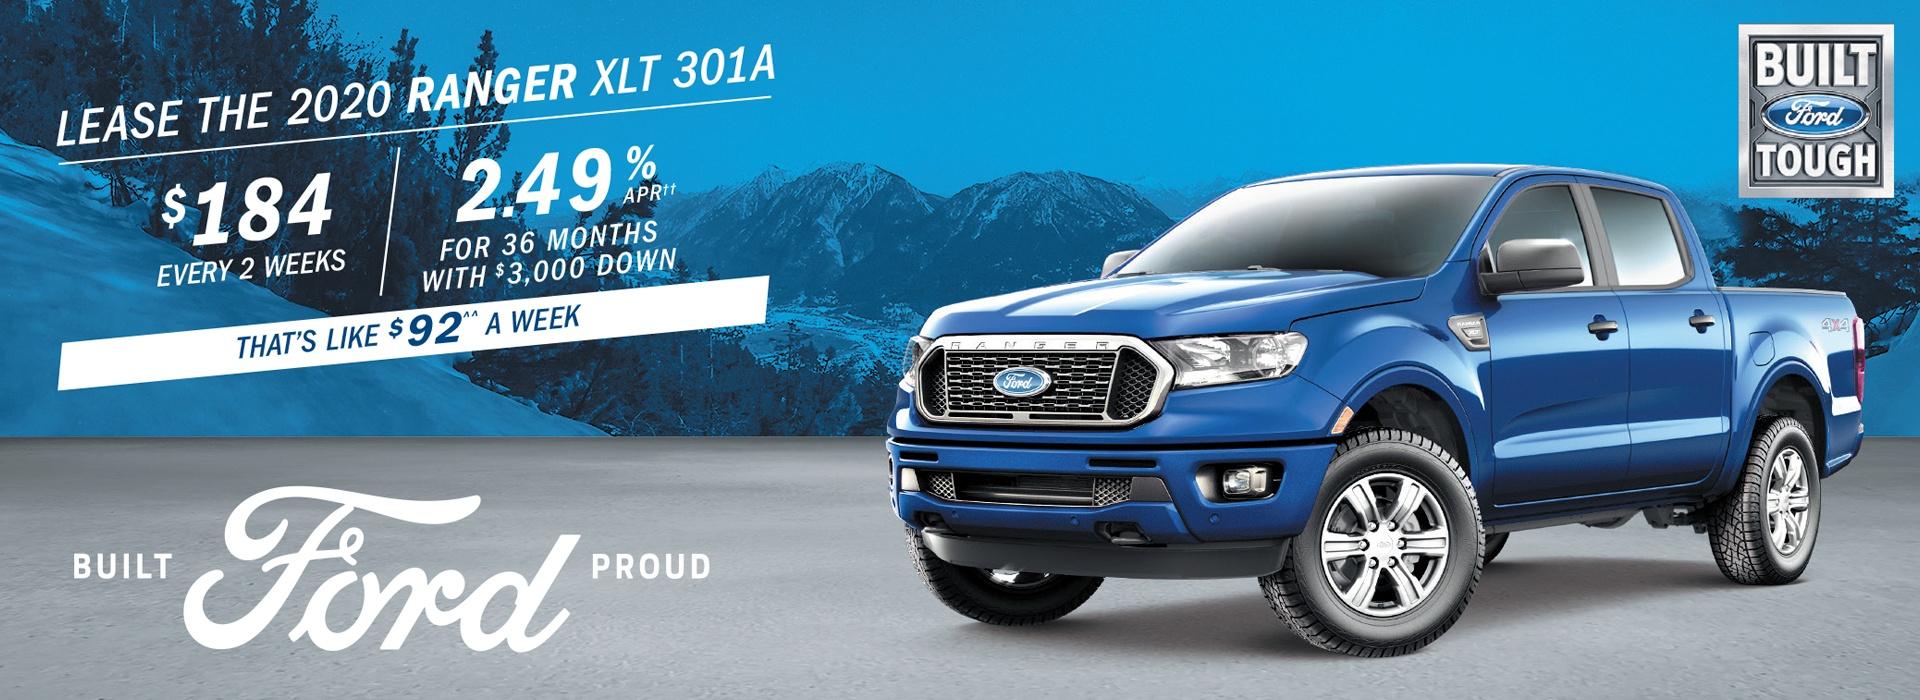 Ford Ranger Special Offer